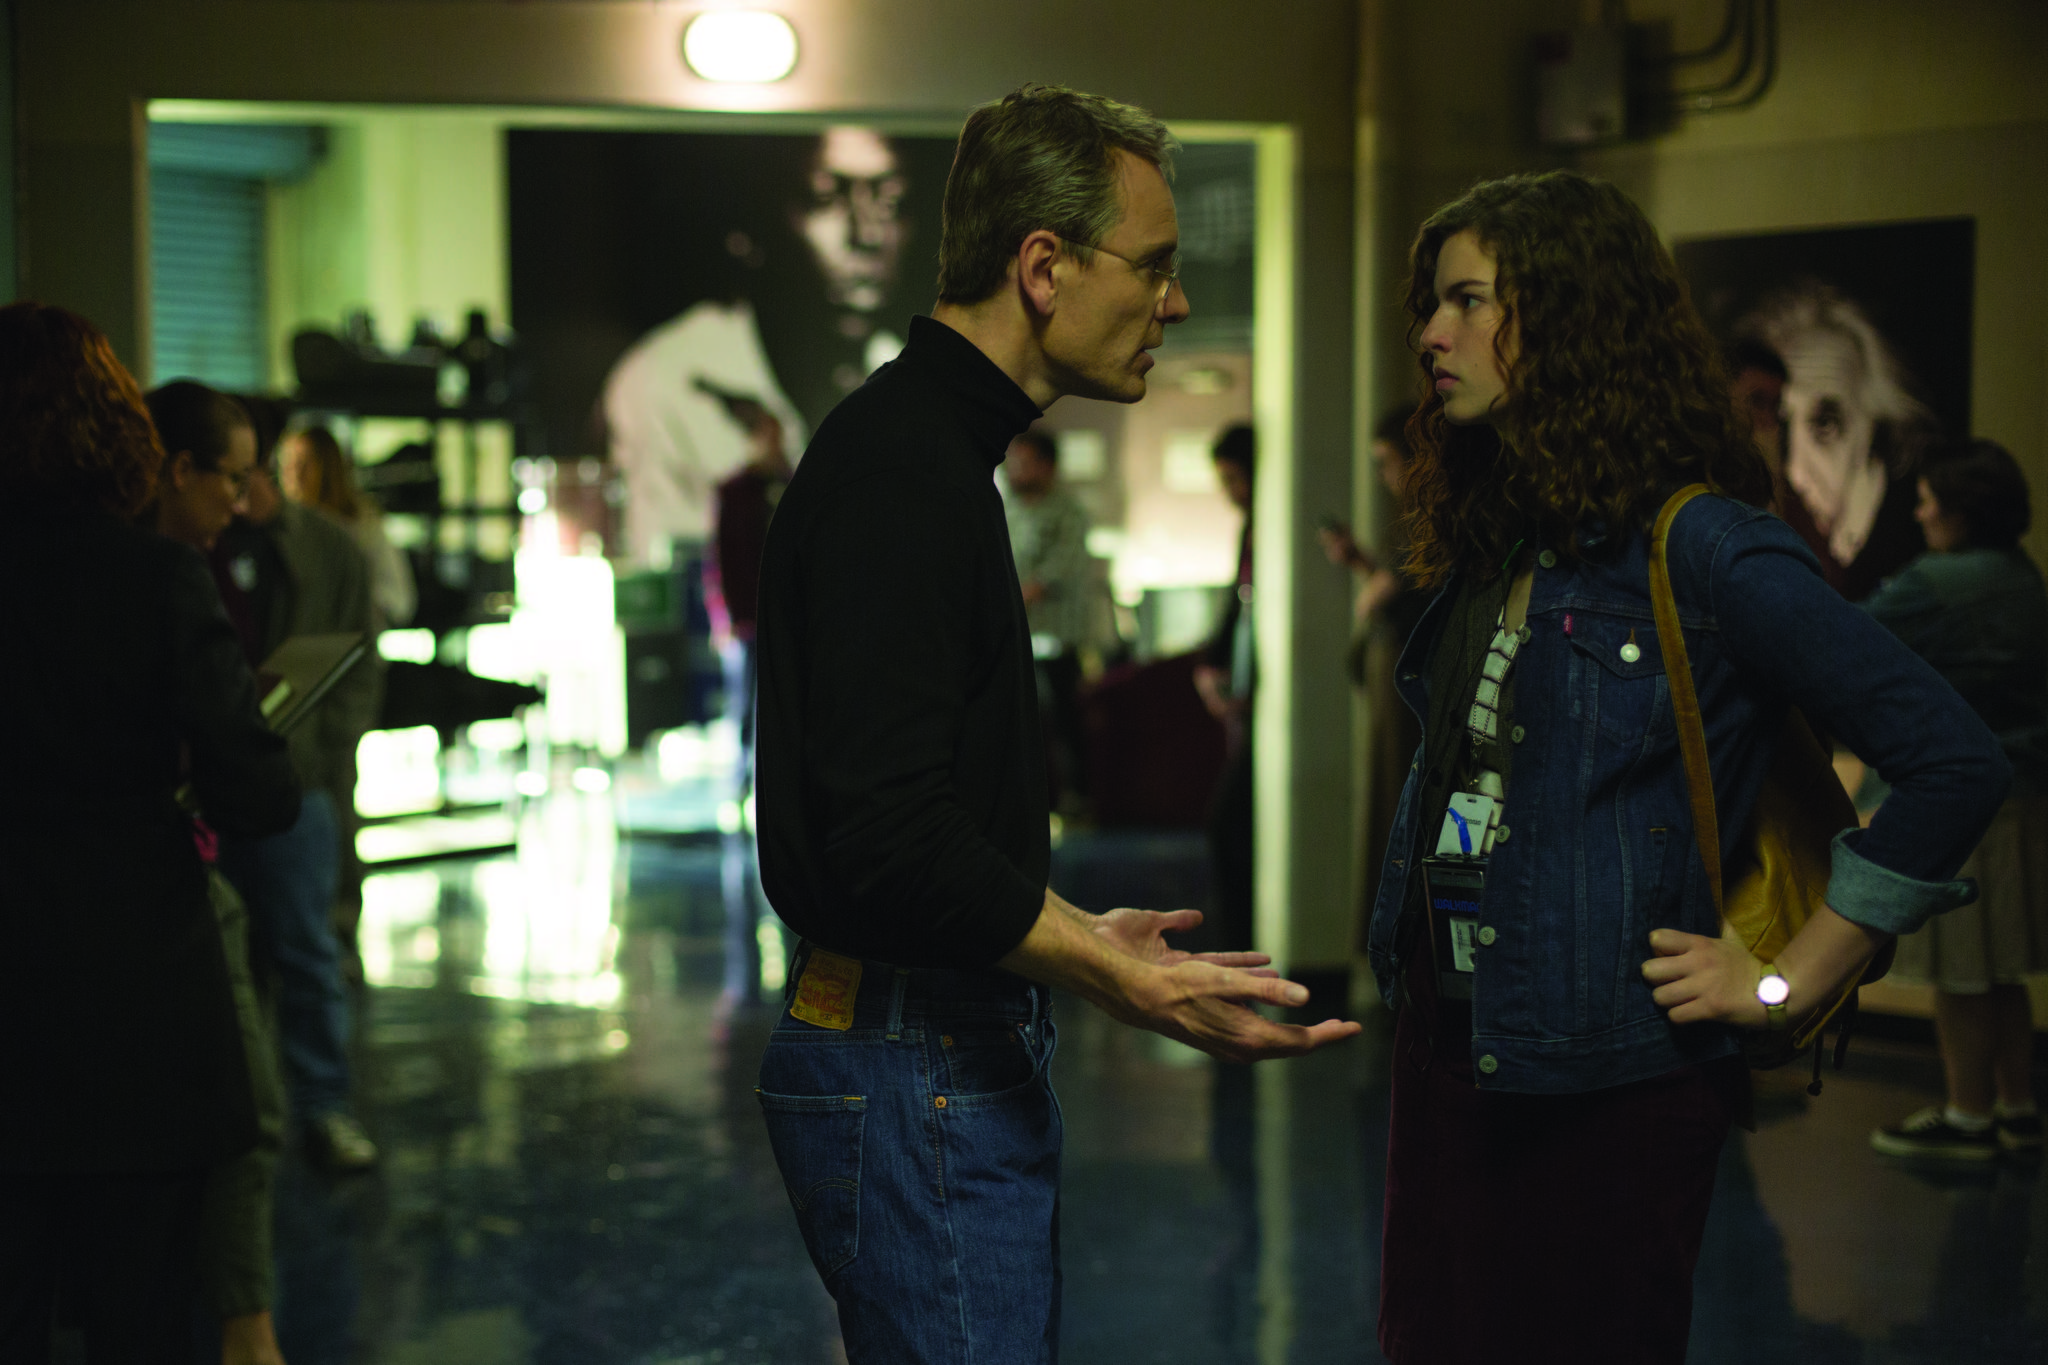 Michael Fassbender and Perla Haney-Jardine in Steve Jobs (2015)